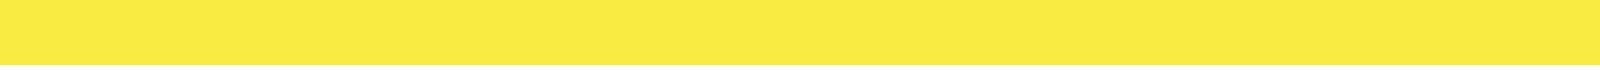 rasgado_topo_amarelo